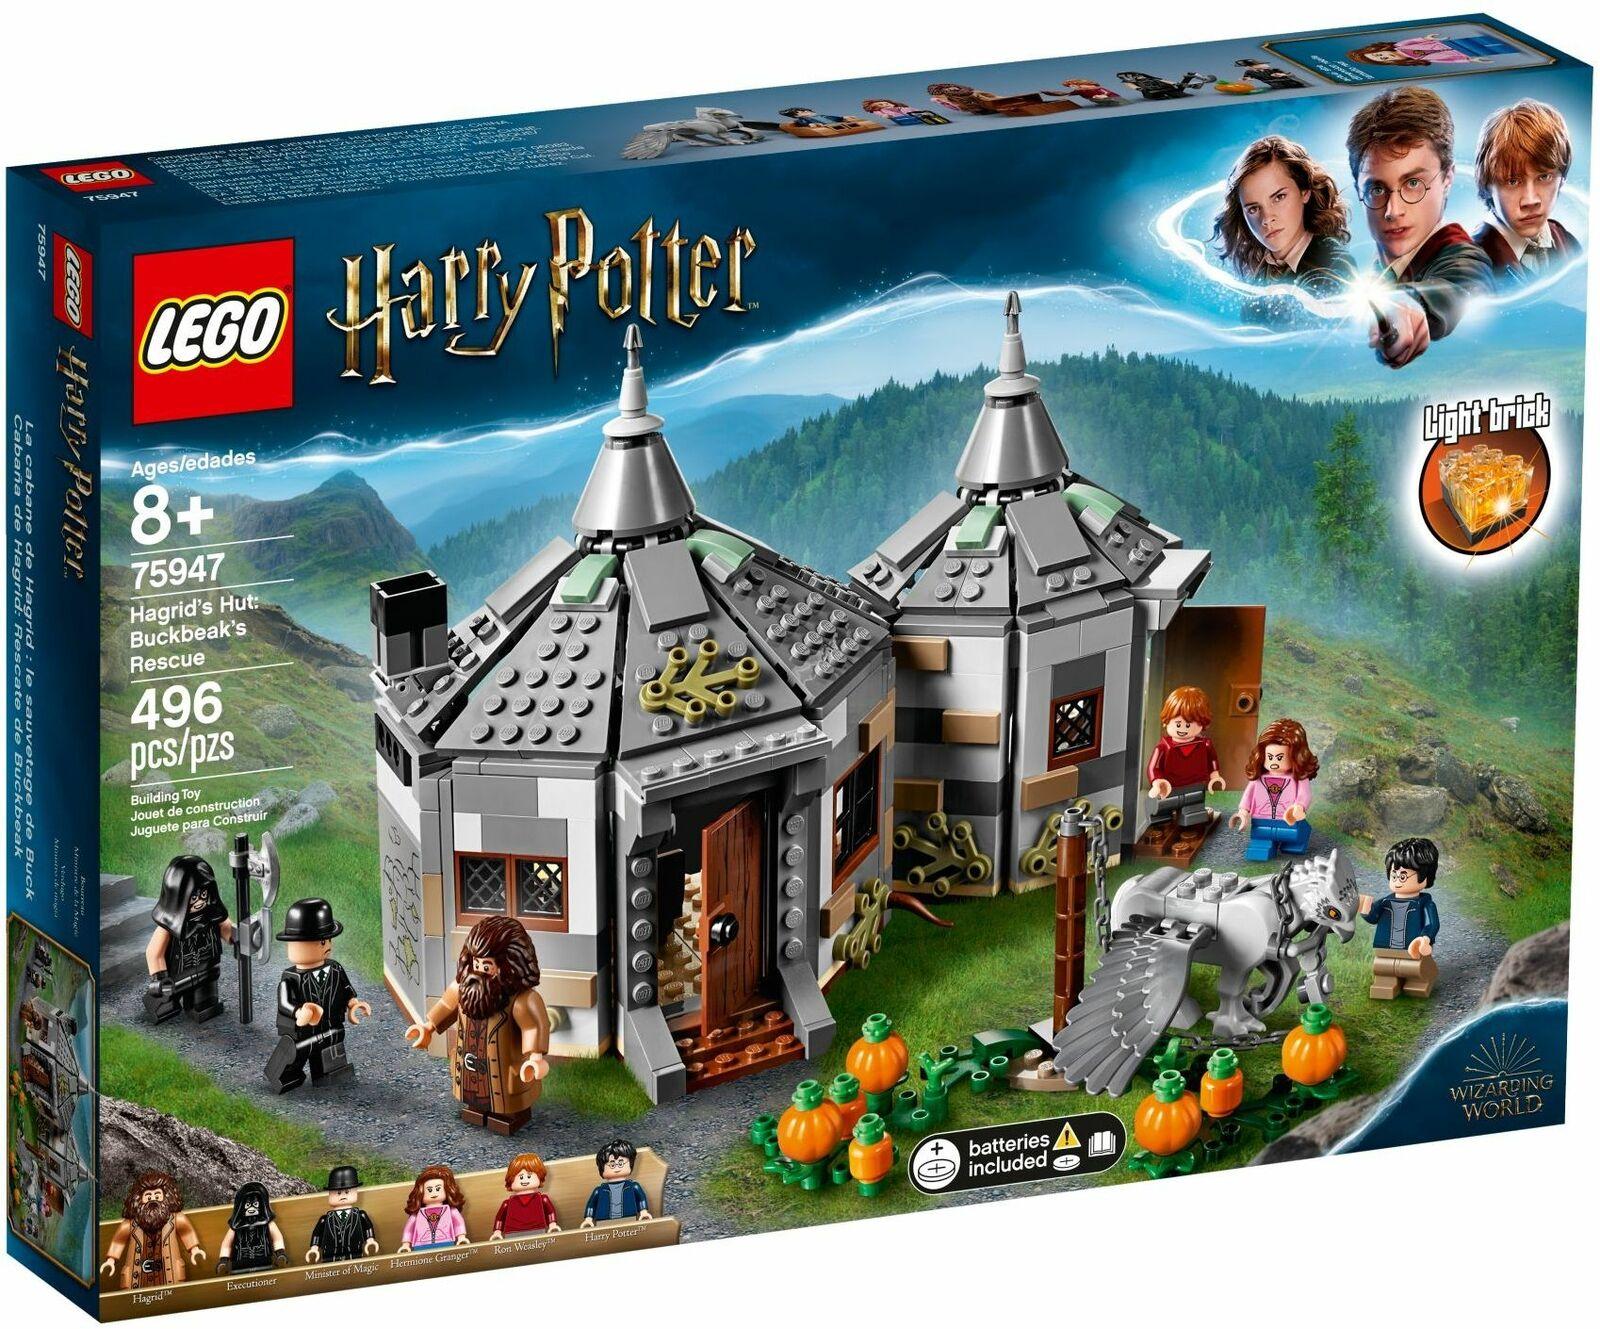 LEGO Harry Potter Hagrid's Hut  Buckbeak's Rescue 75947 FREE SHIPPING